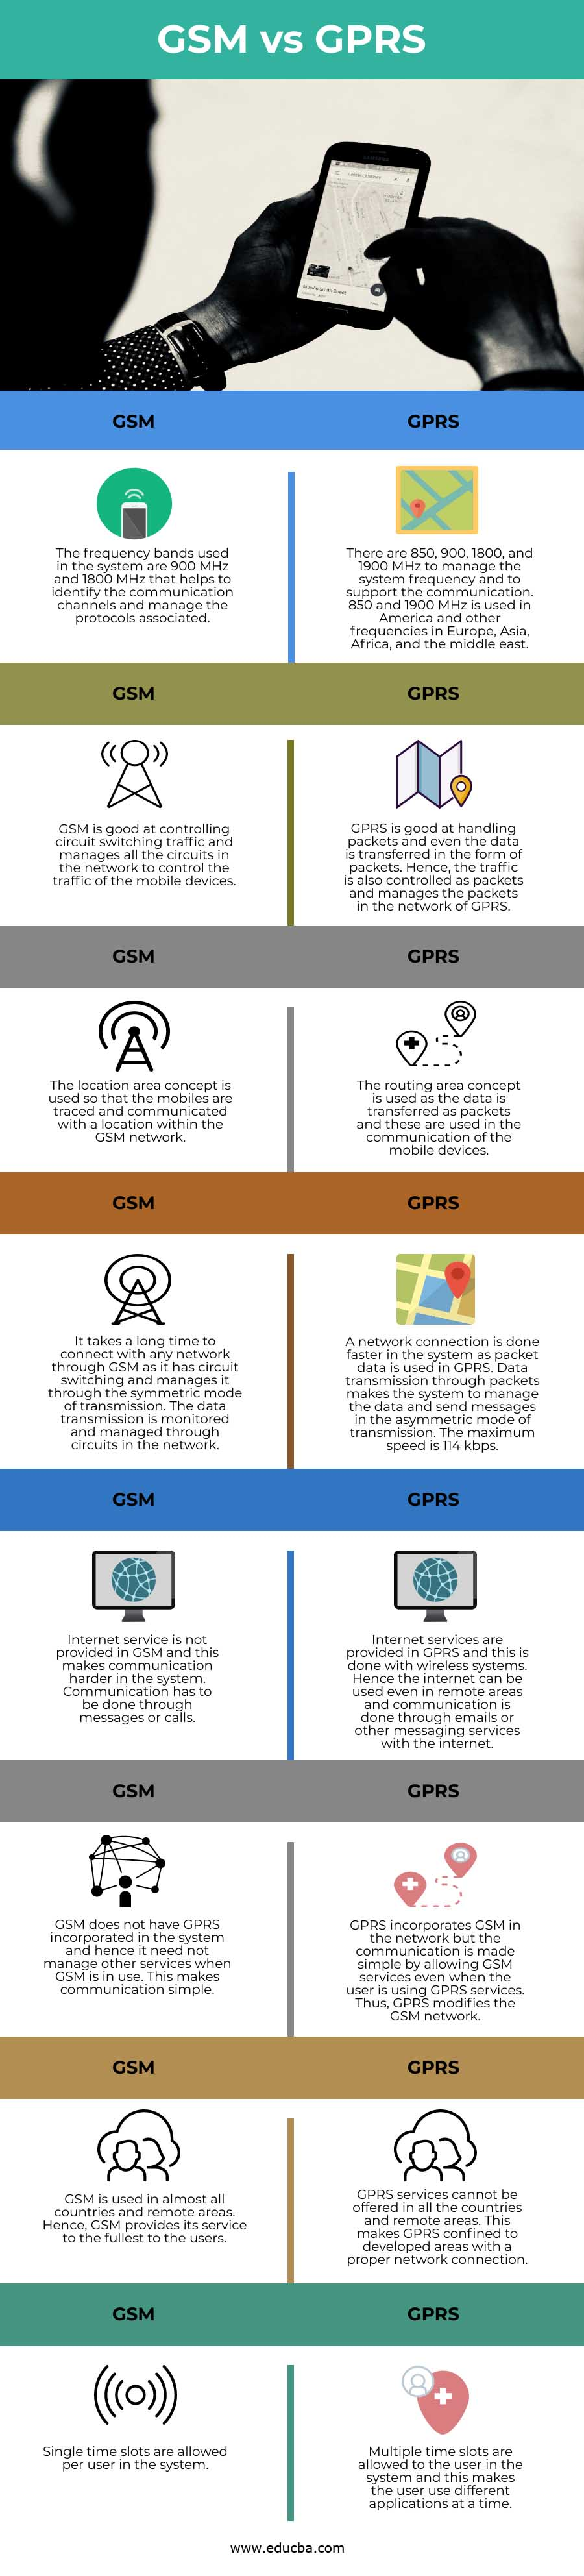 GSM vs GPRS info